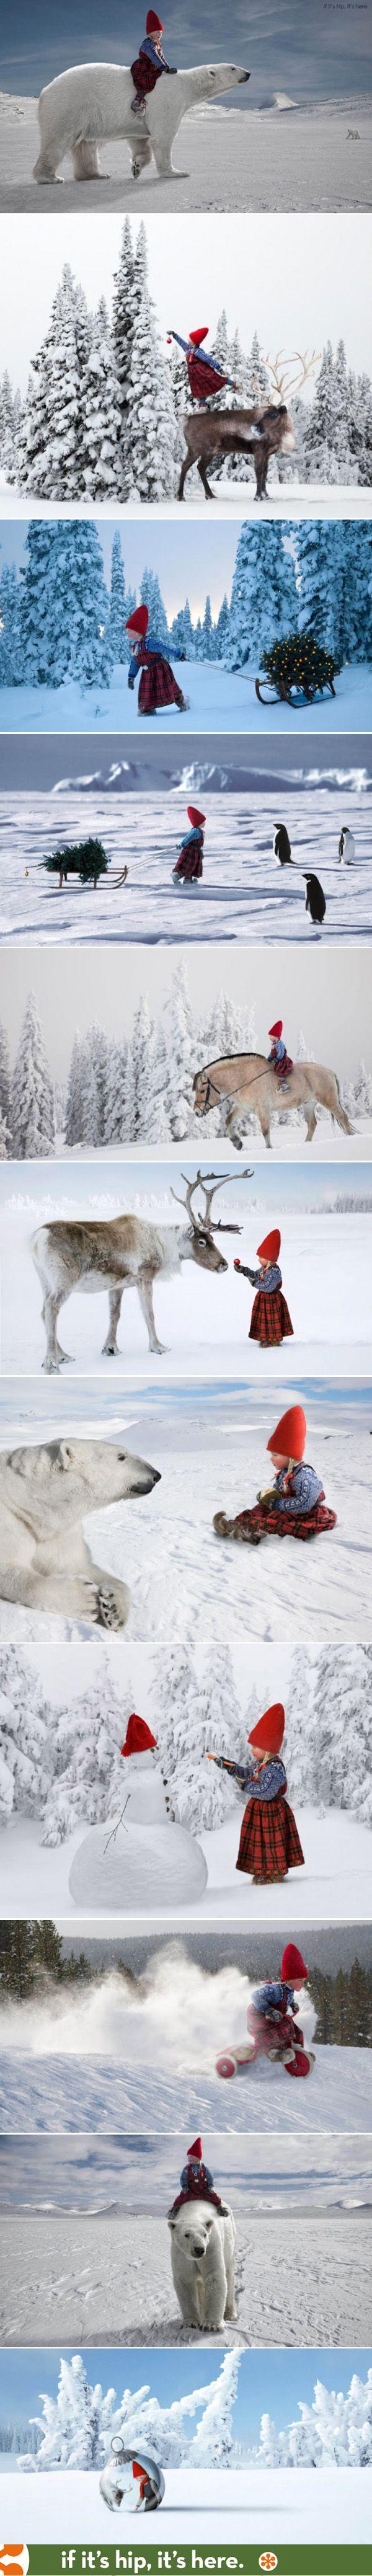 Enchanting Winter Magic photos of a Nordic Christmas | http://www.ifitshipitshere.com/winter-magic-spellbinding-photographs-by-per-breiehagen-for-italian-childrens-brand-chicco/